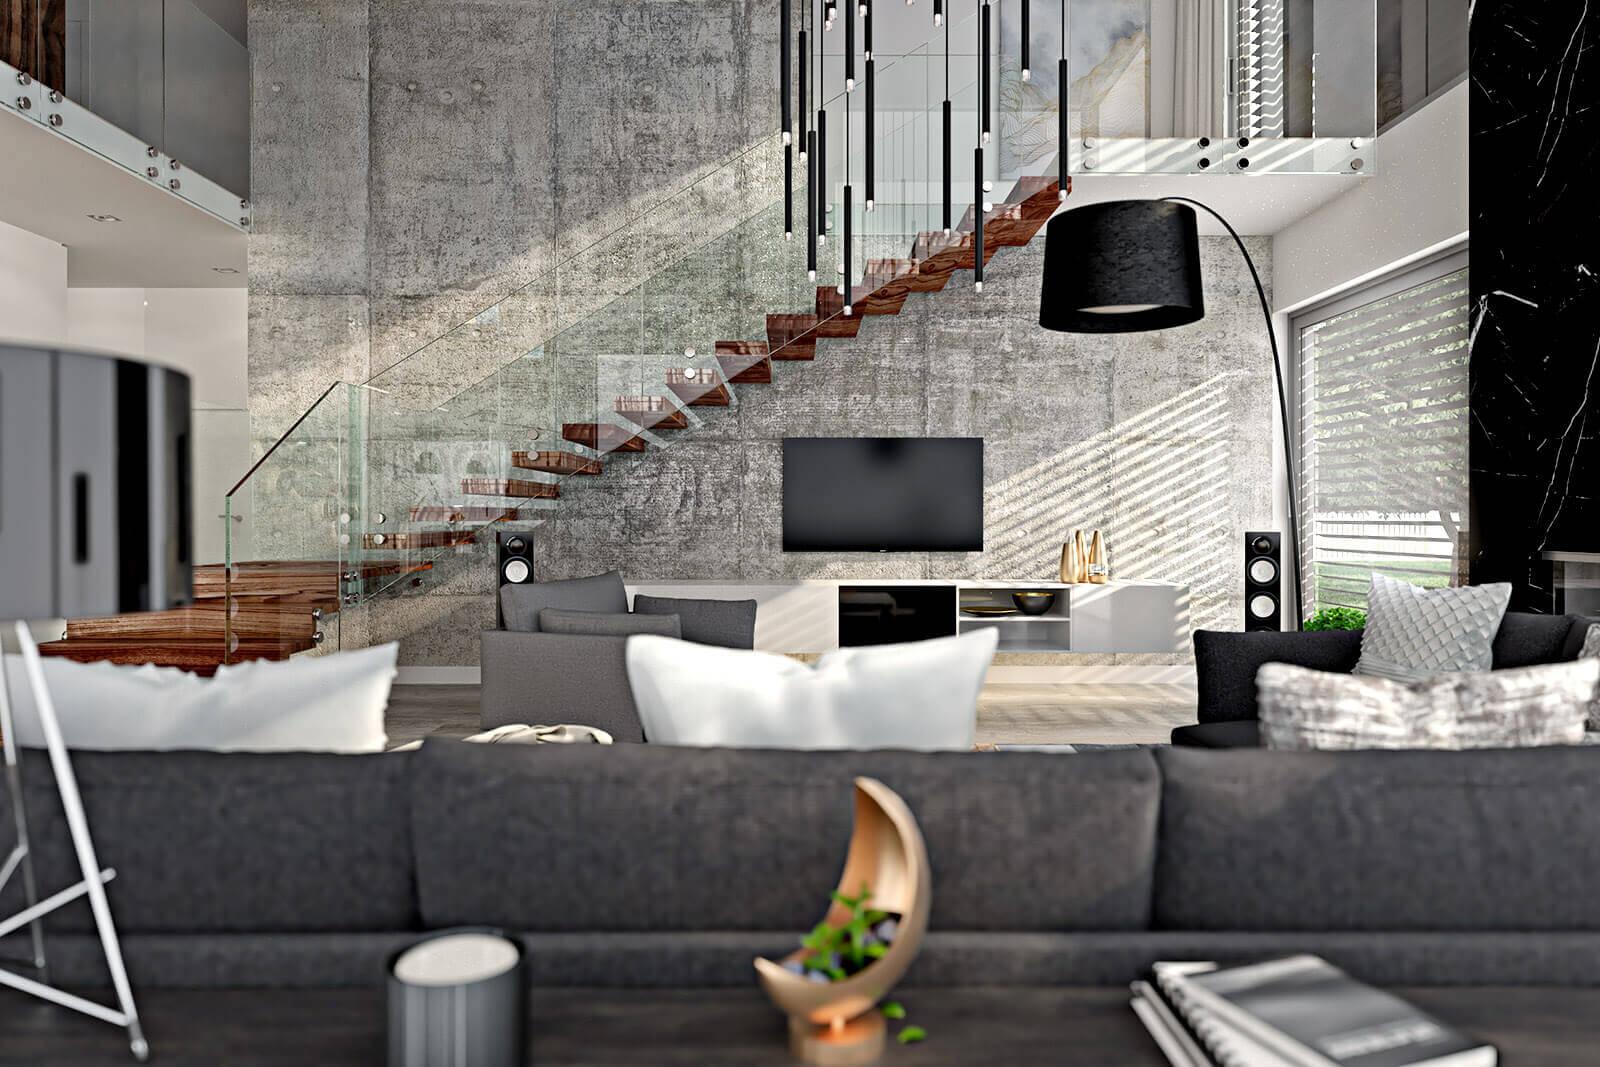 Best Artist for Architectural Interior Visualization Service Aunar 3d